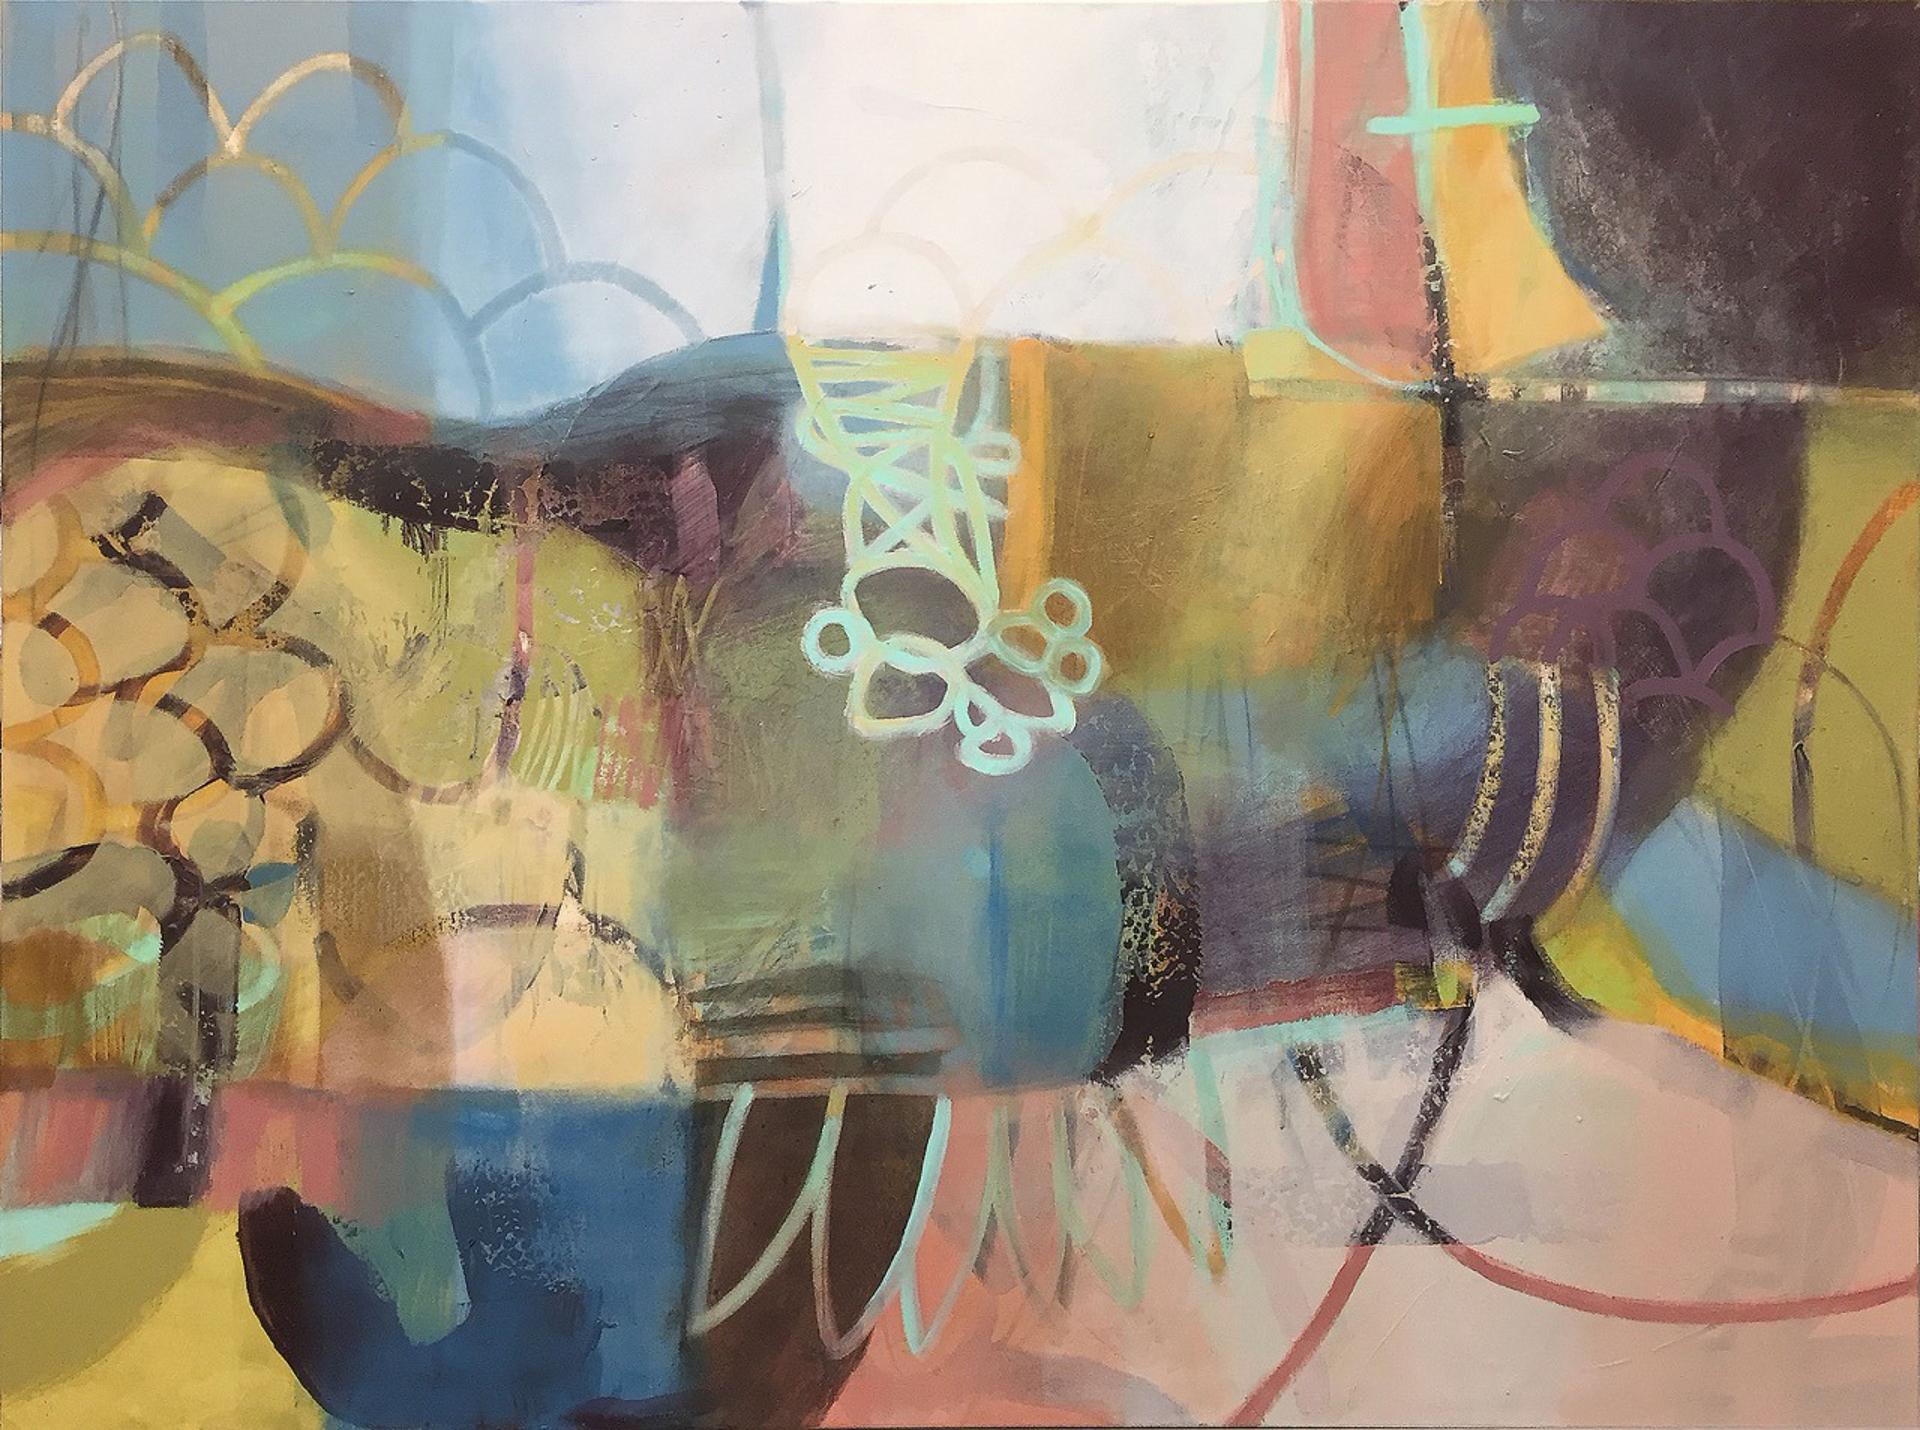 Untitled 175468 by Karen Roehl